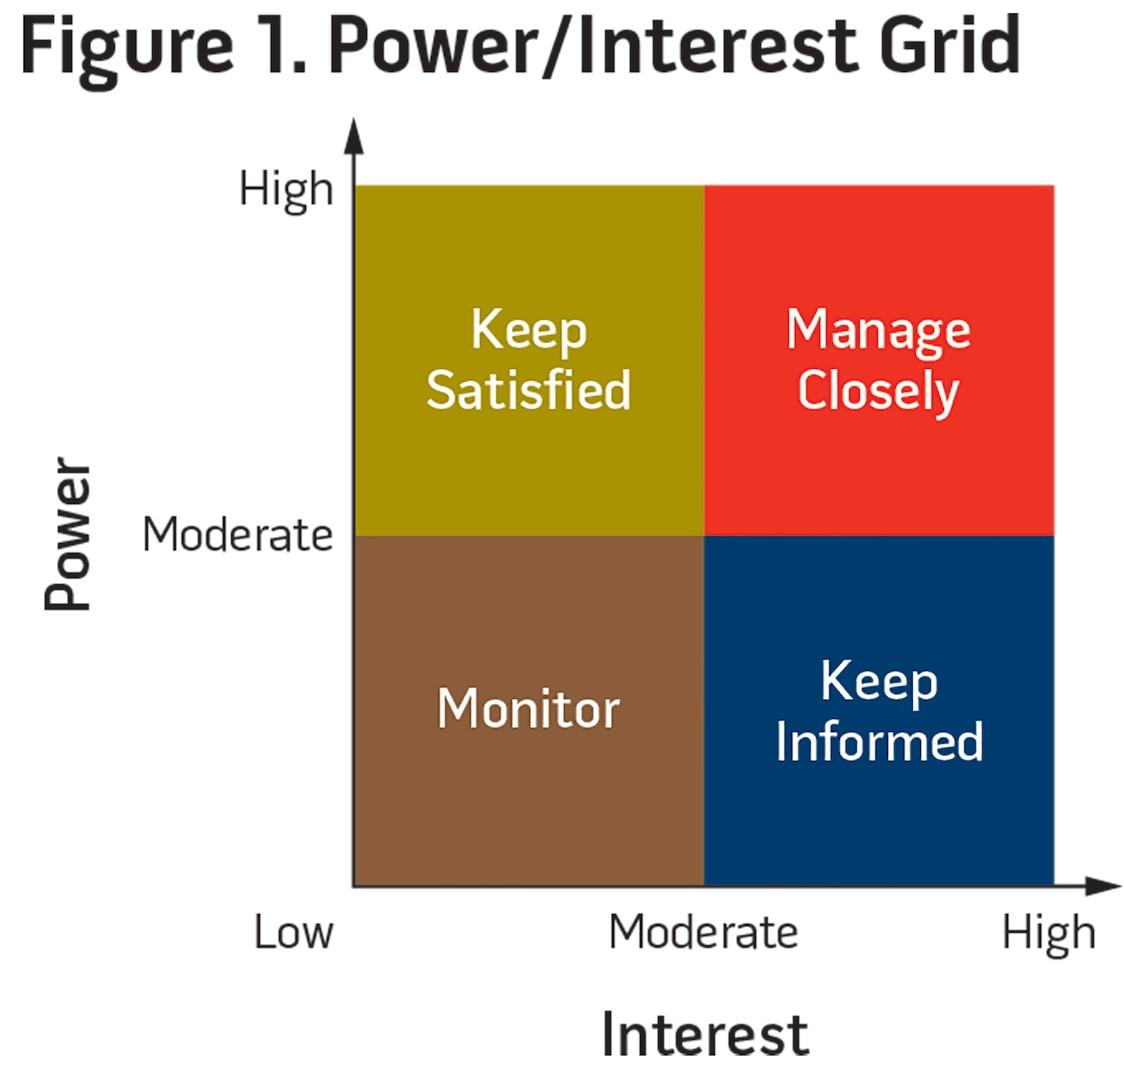 Figure 1. Power/Interest Grid